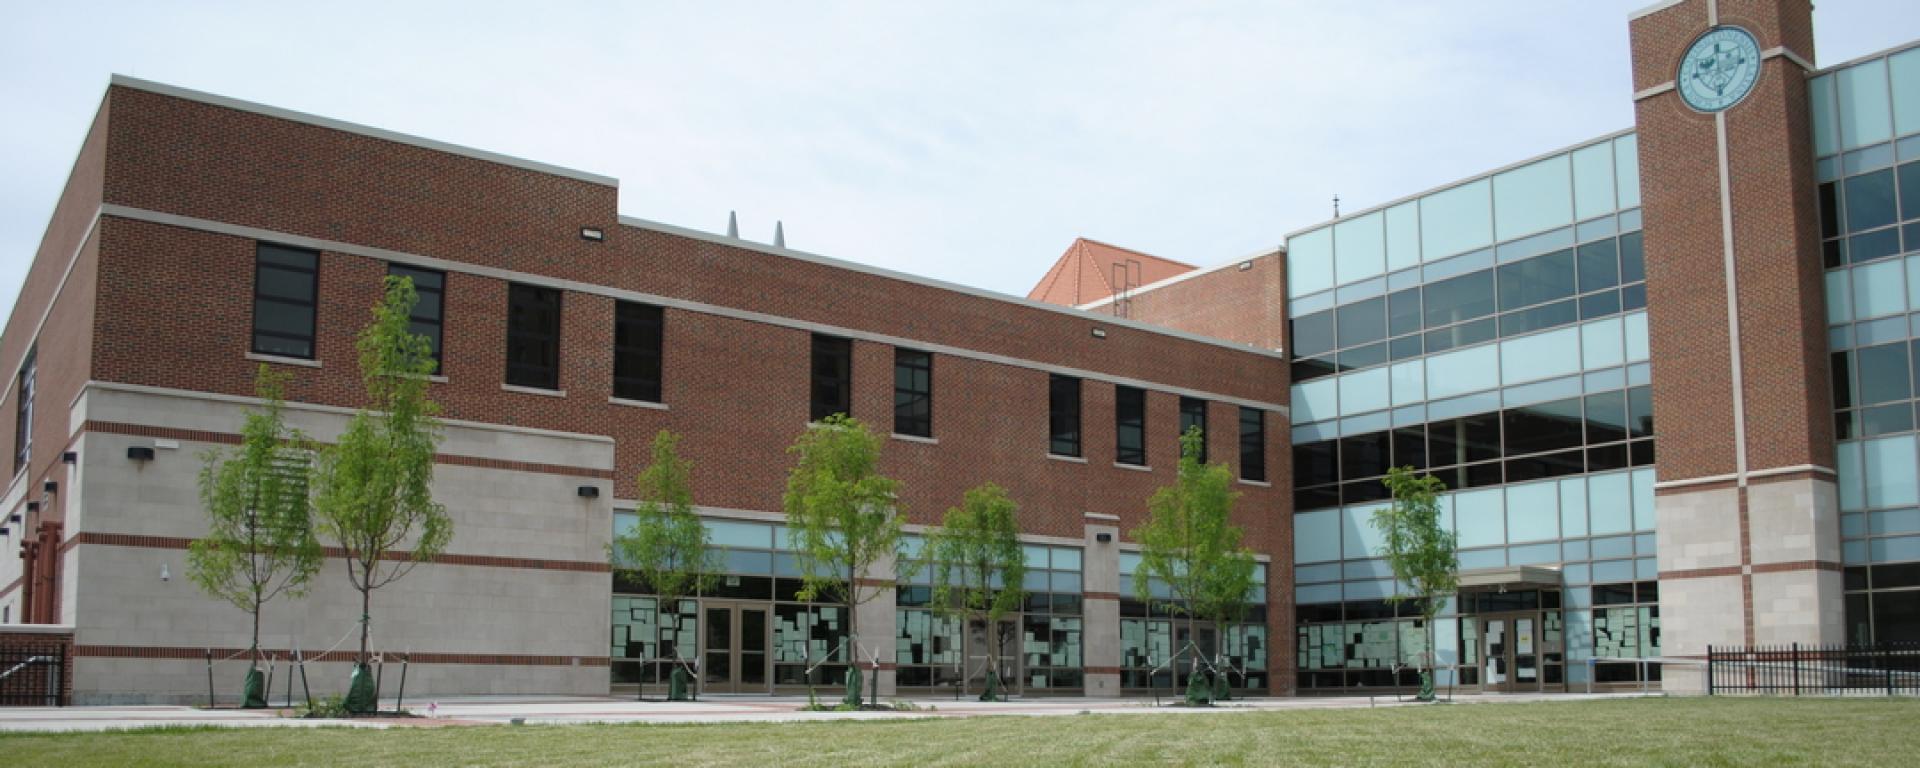 Front profile of Covington Latin School